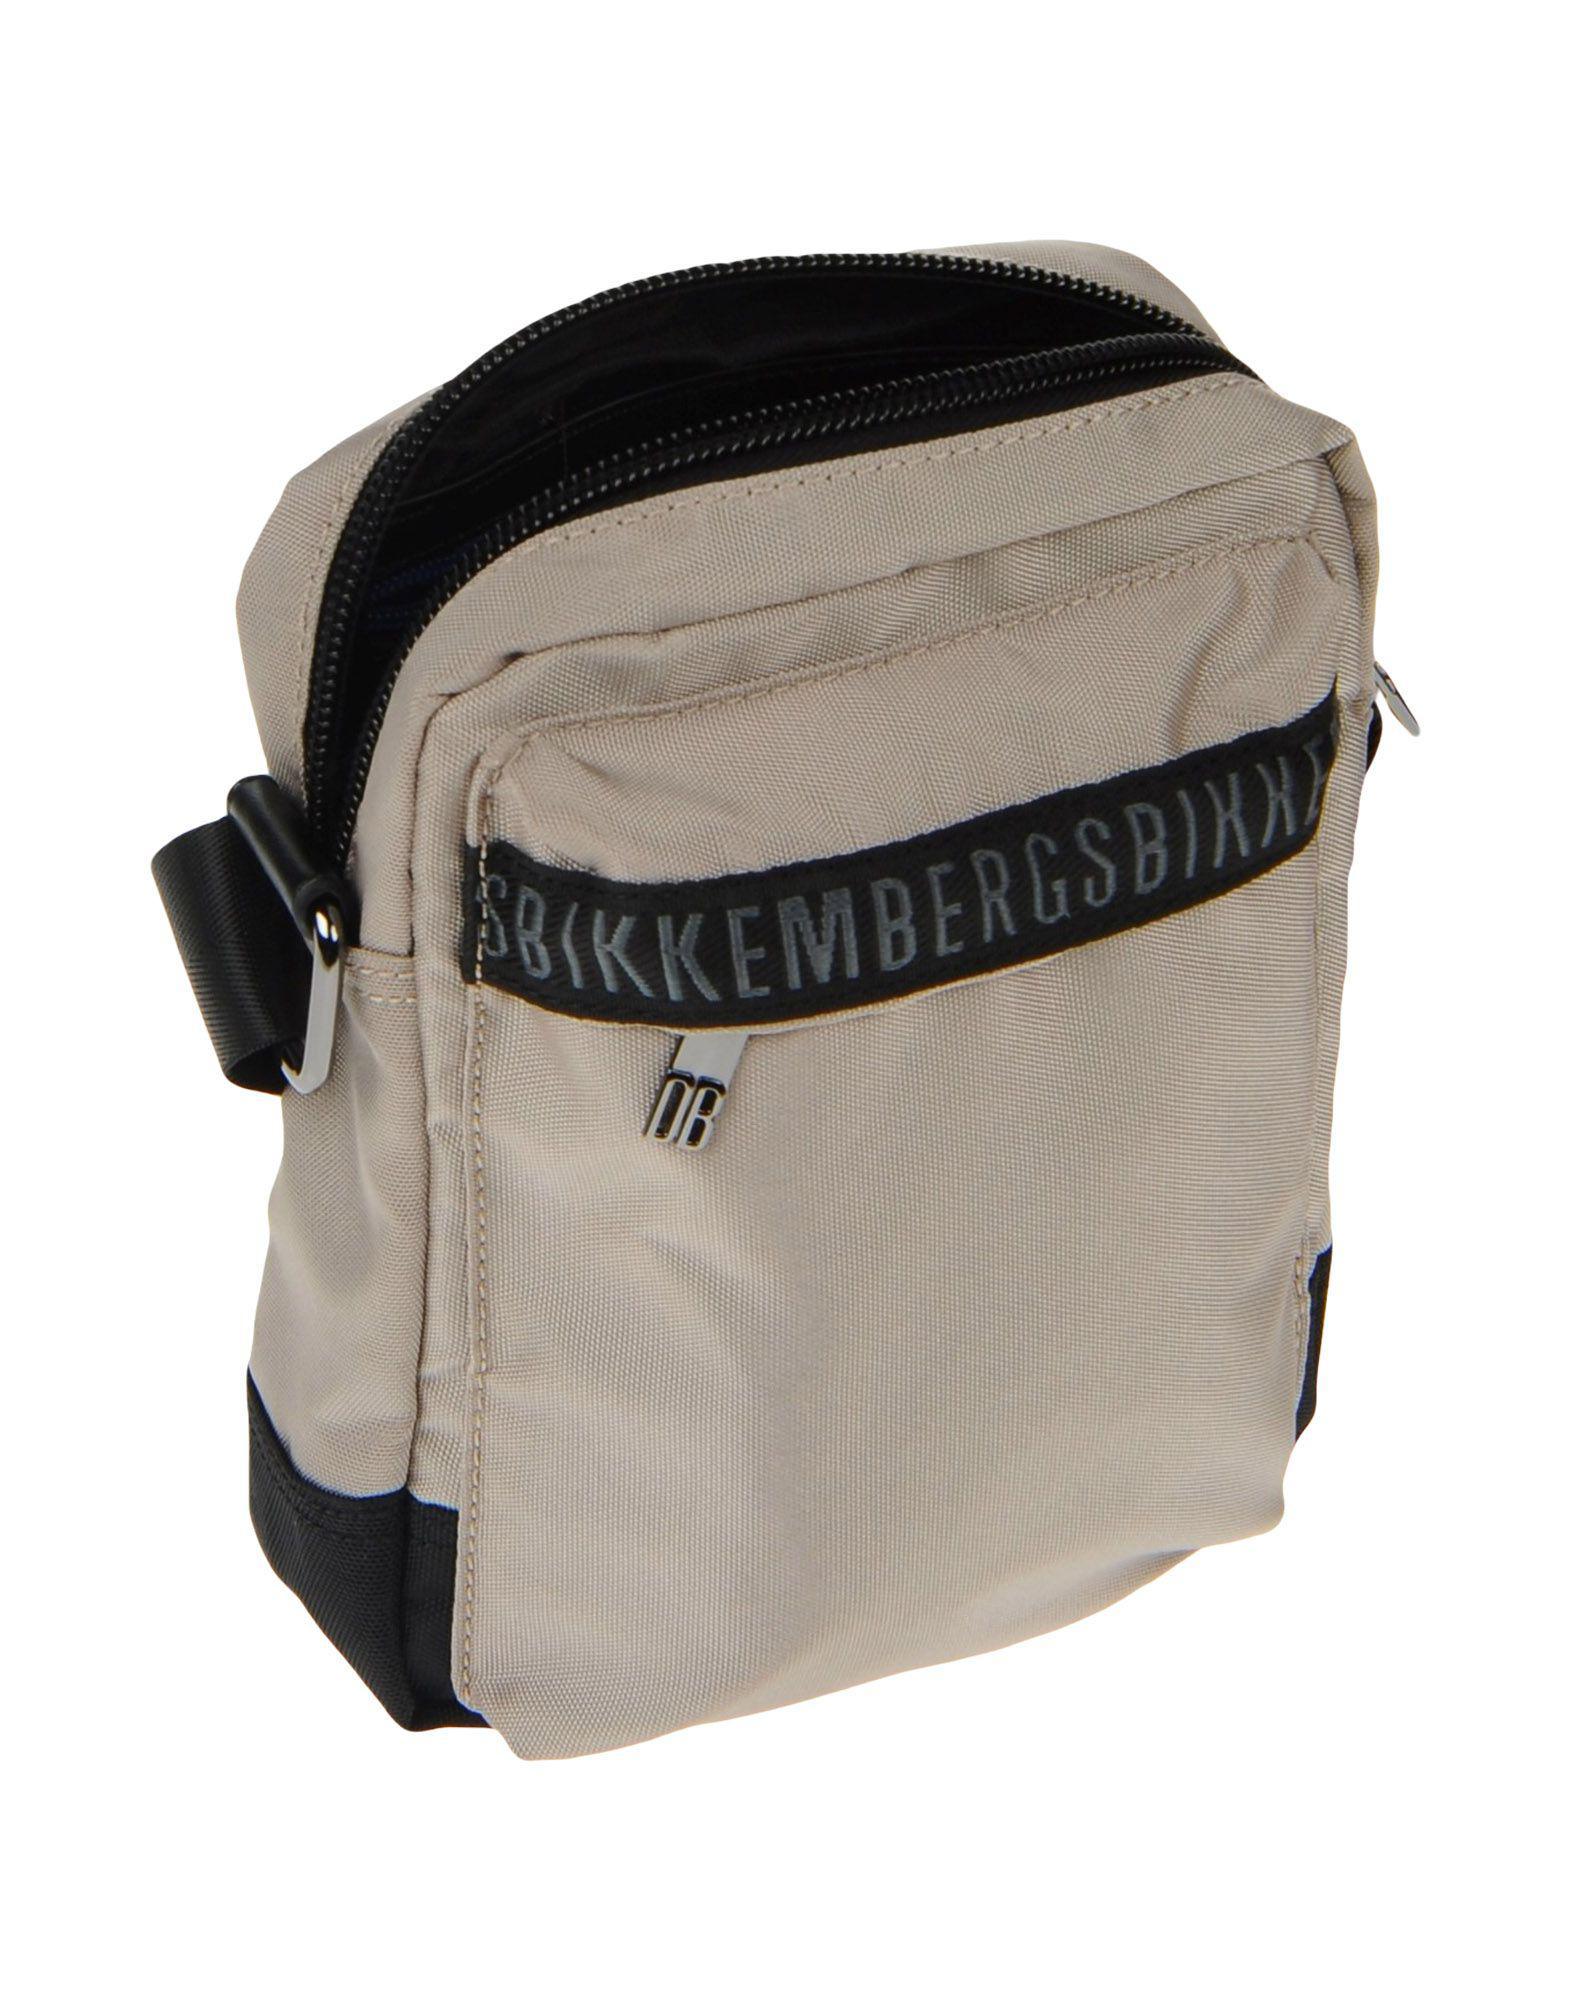 Bikkembergs Synthetic Cross-body Bag in Beige (Natural) for Men